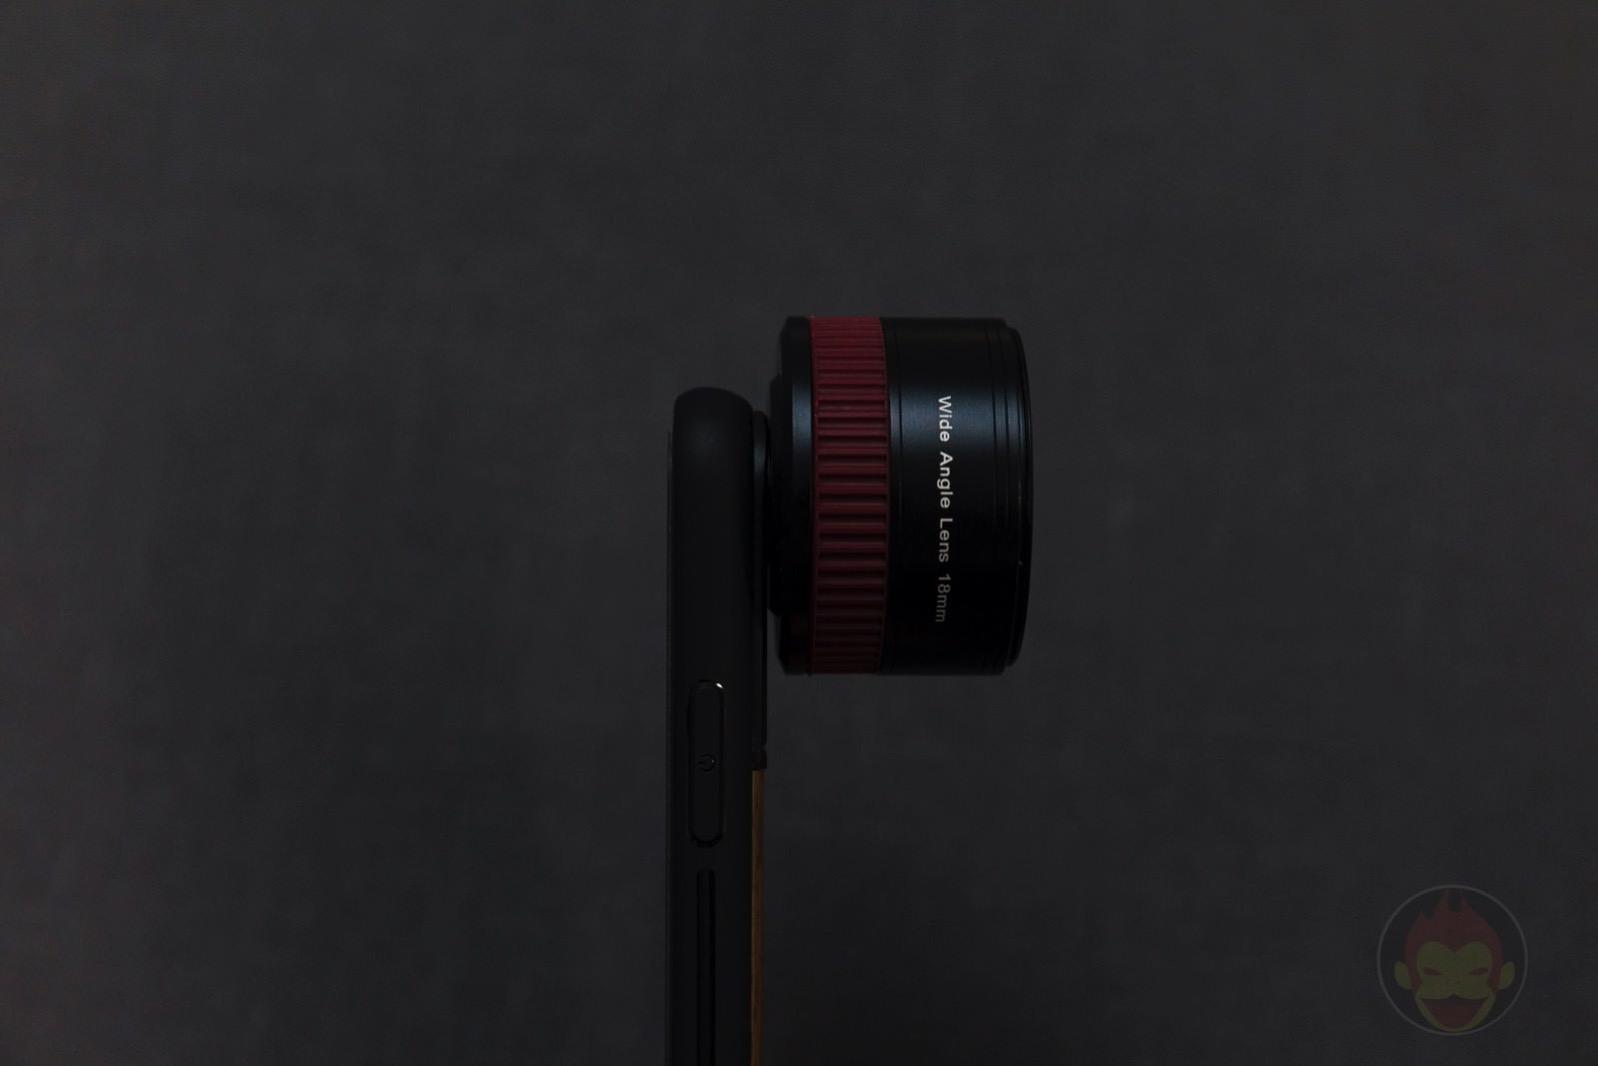 USHADOW-X1-Lens-System-Review-09.jpg